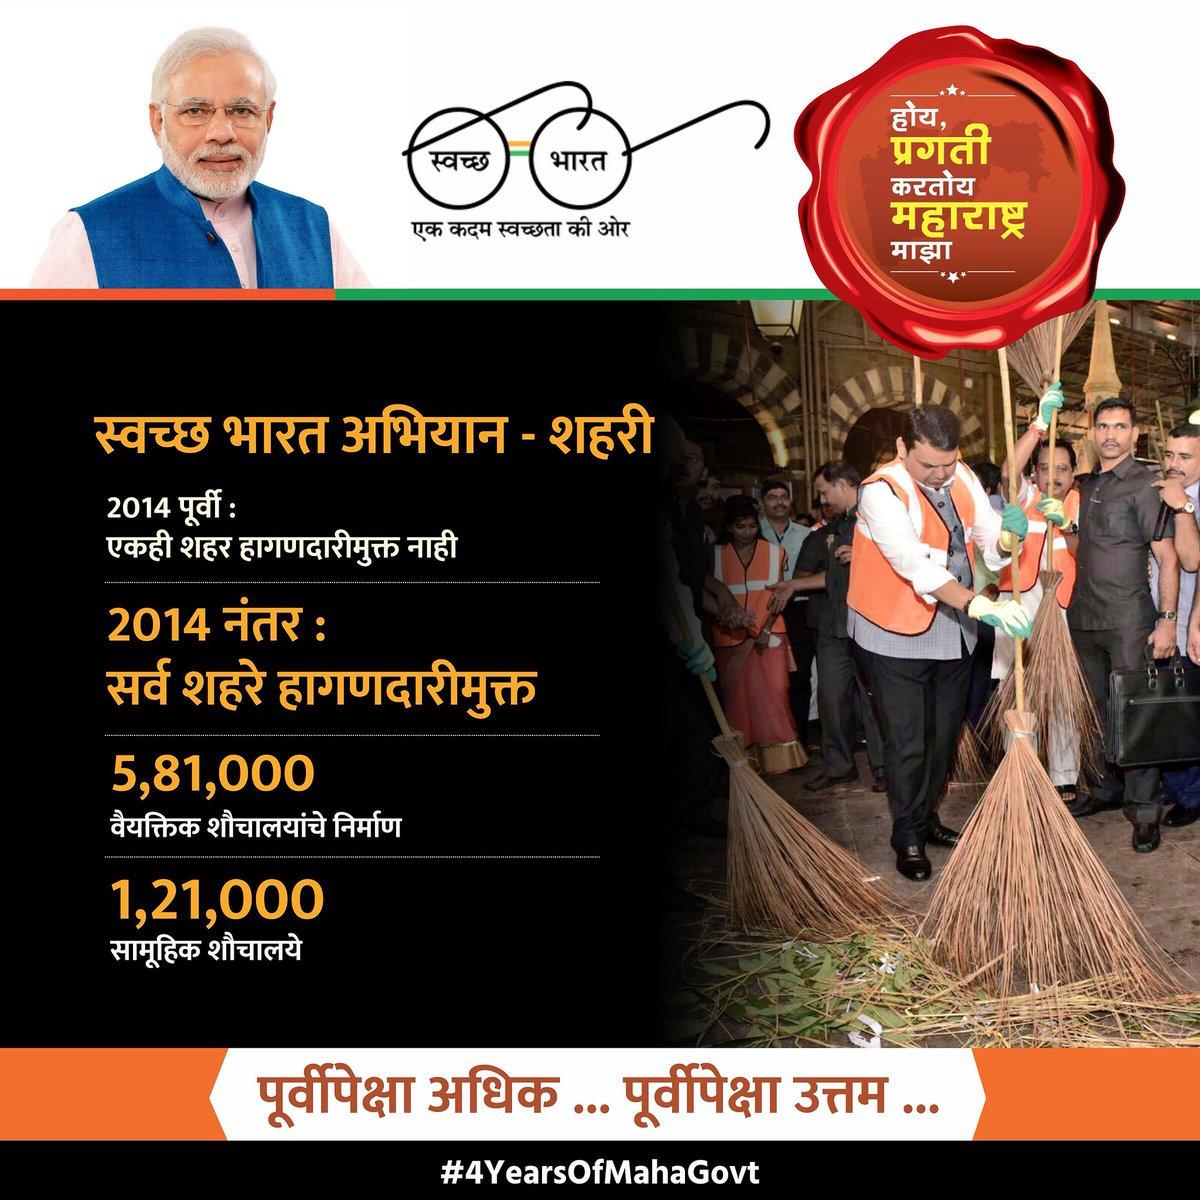 स्वच्छ भारत अभियान - शहरी #SwachhBharat Mission - Urban #पूर्वीपेक्षा_अधिक_पूर्वीपेक्षा_उत्तम #4YearsOfMahaGovt